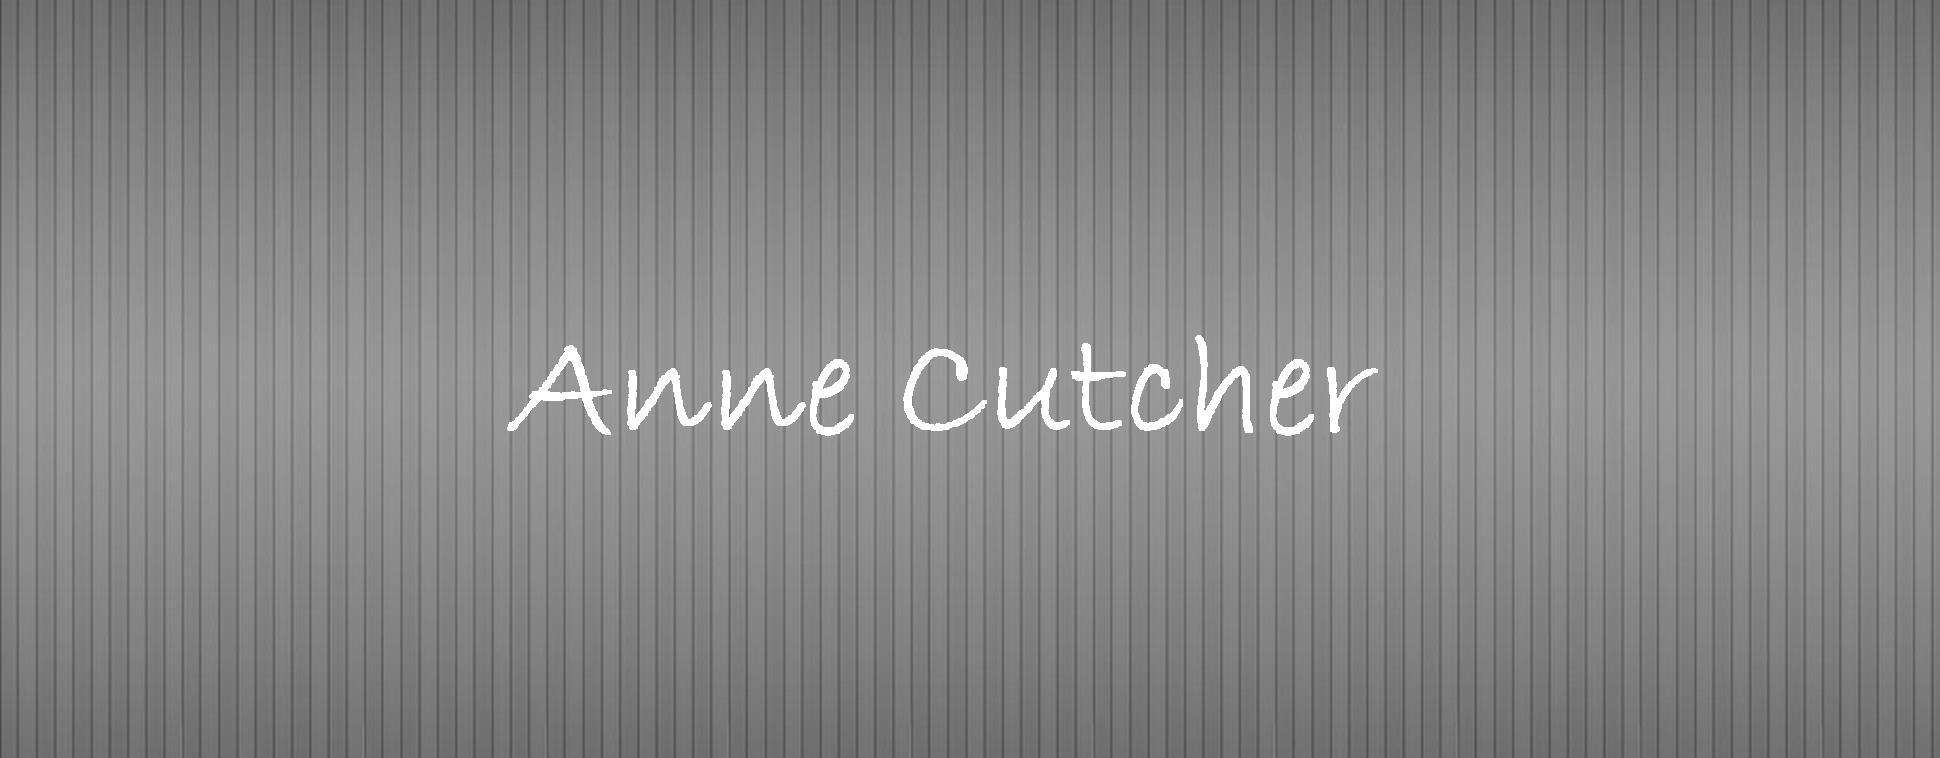 Anne Cutcher.jpg